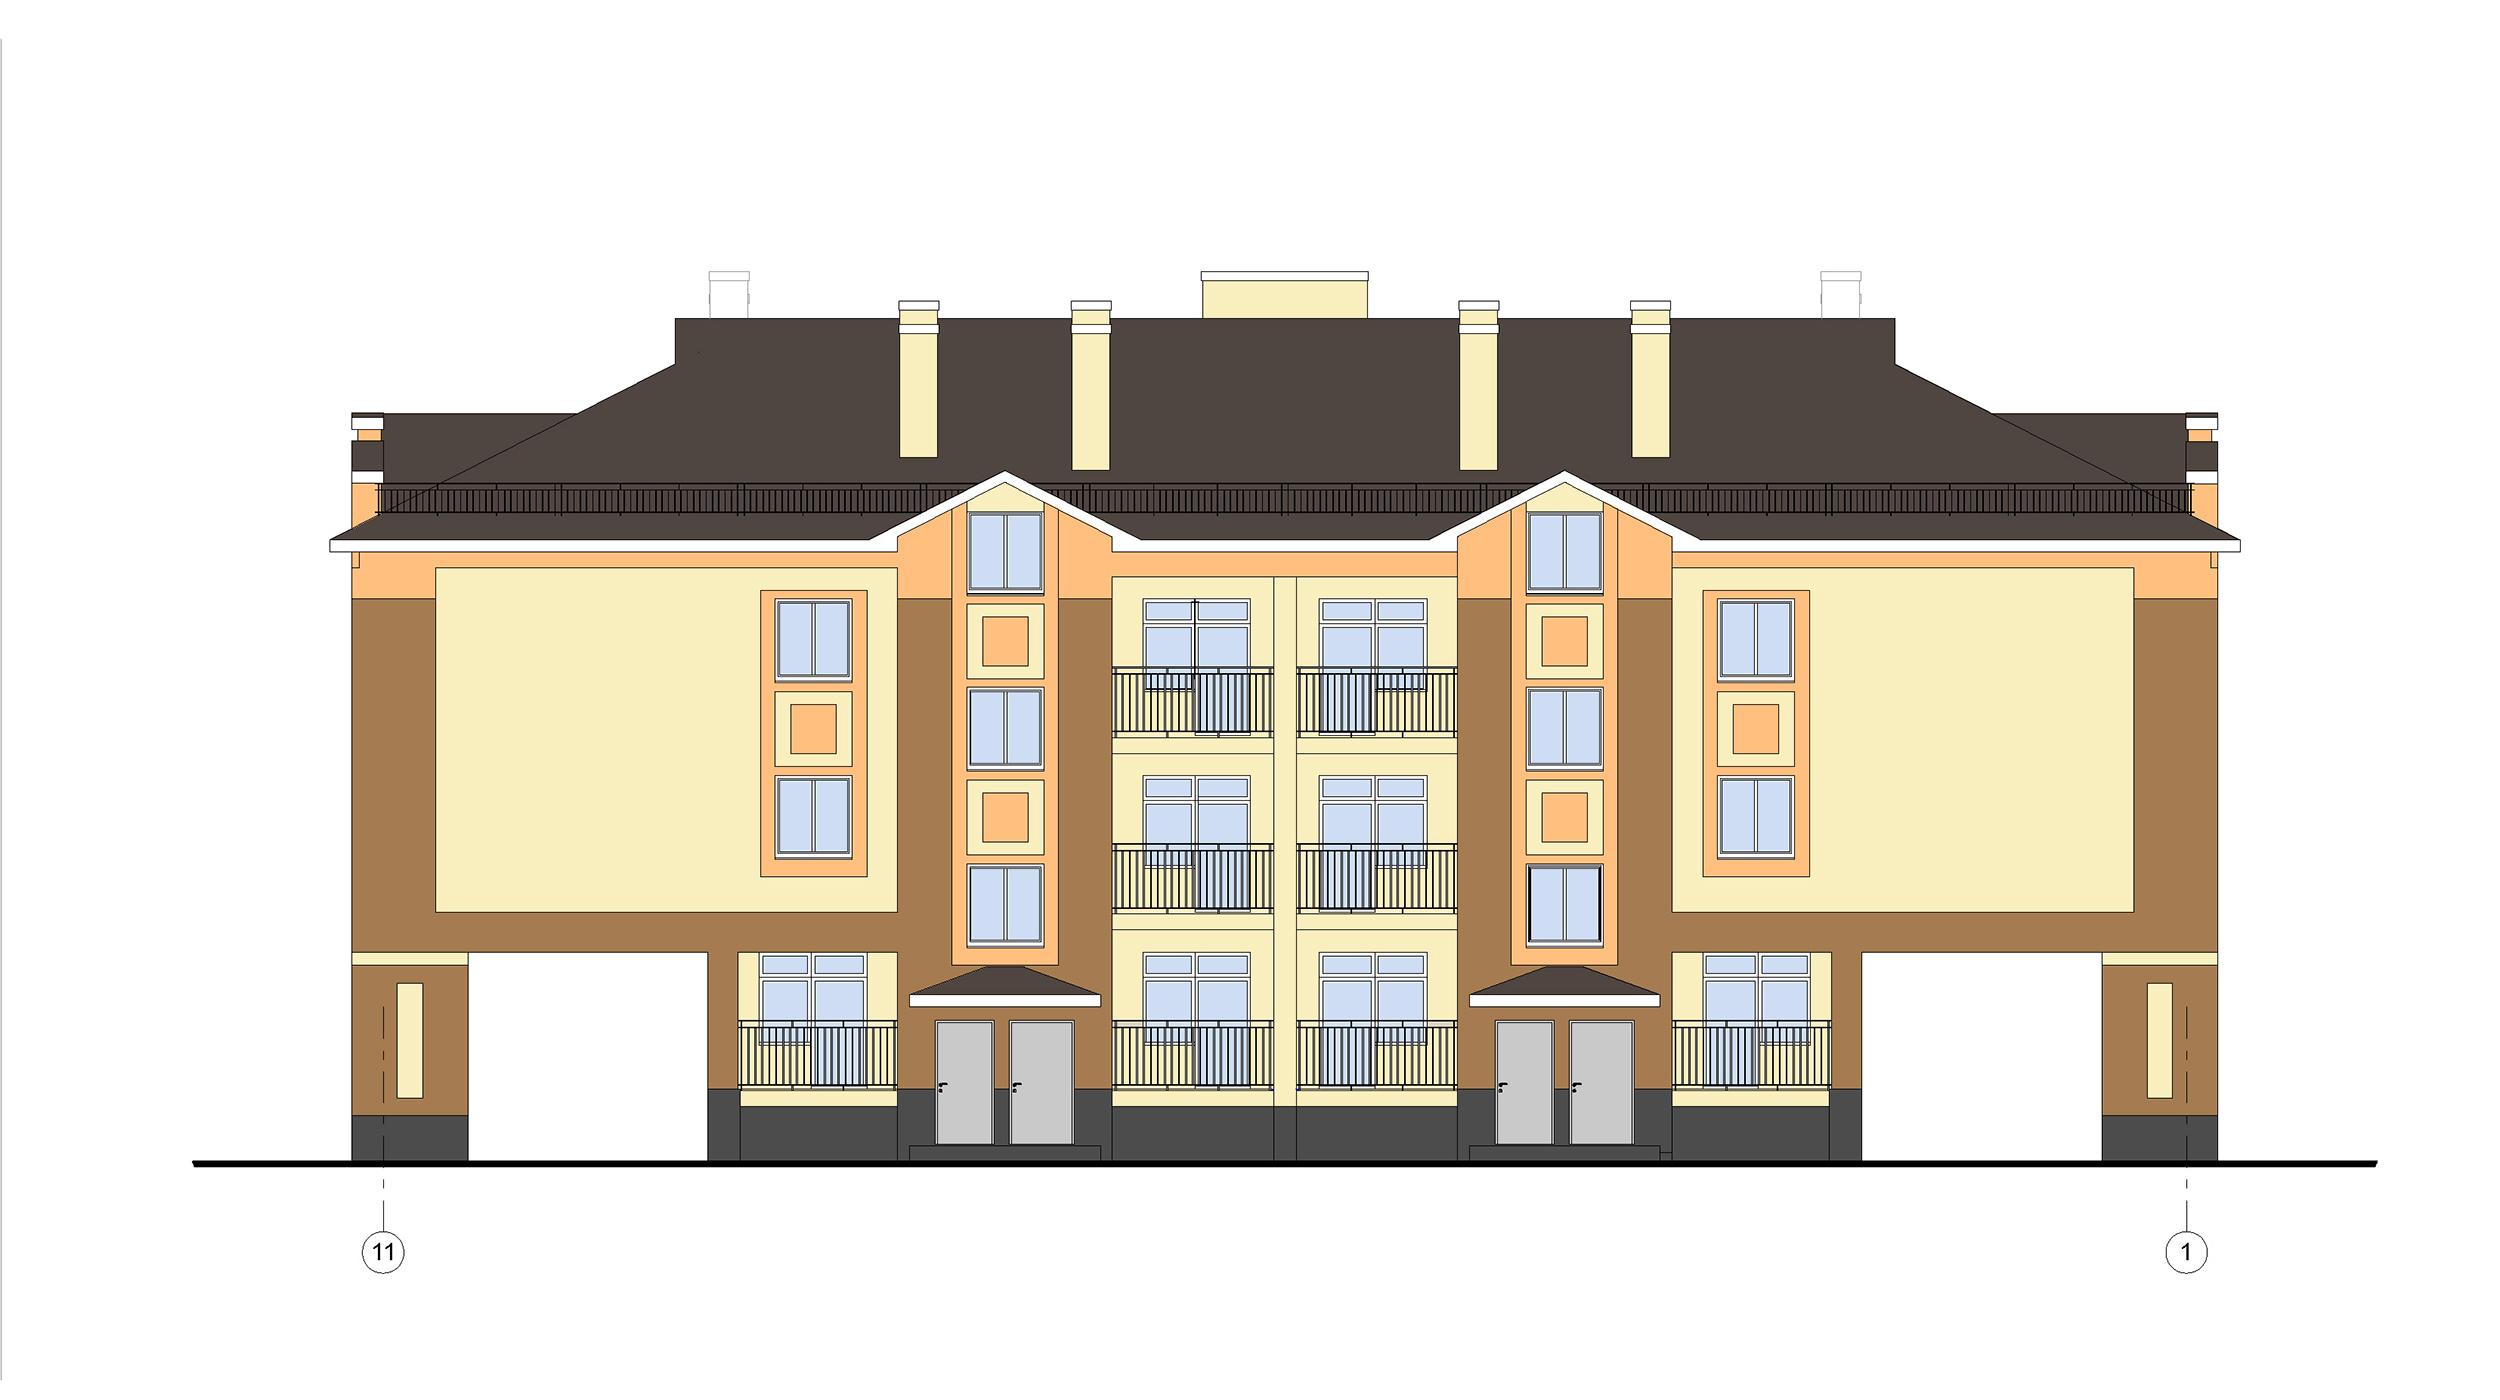 Проект 3-х этажного многоквартирного дома. Фасад в осях 11-1